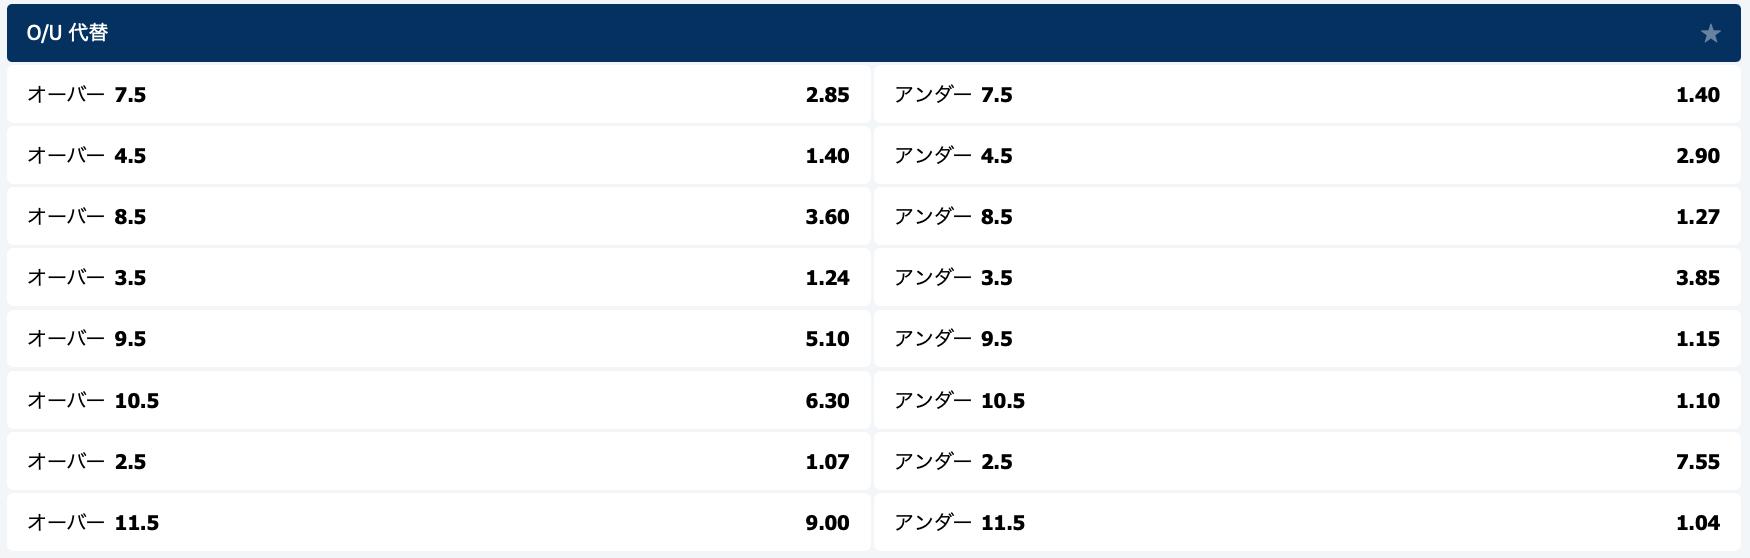 10bet Japan プロ野球やり方賭け方10・オーバーorアンダー o/uさらに細かく